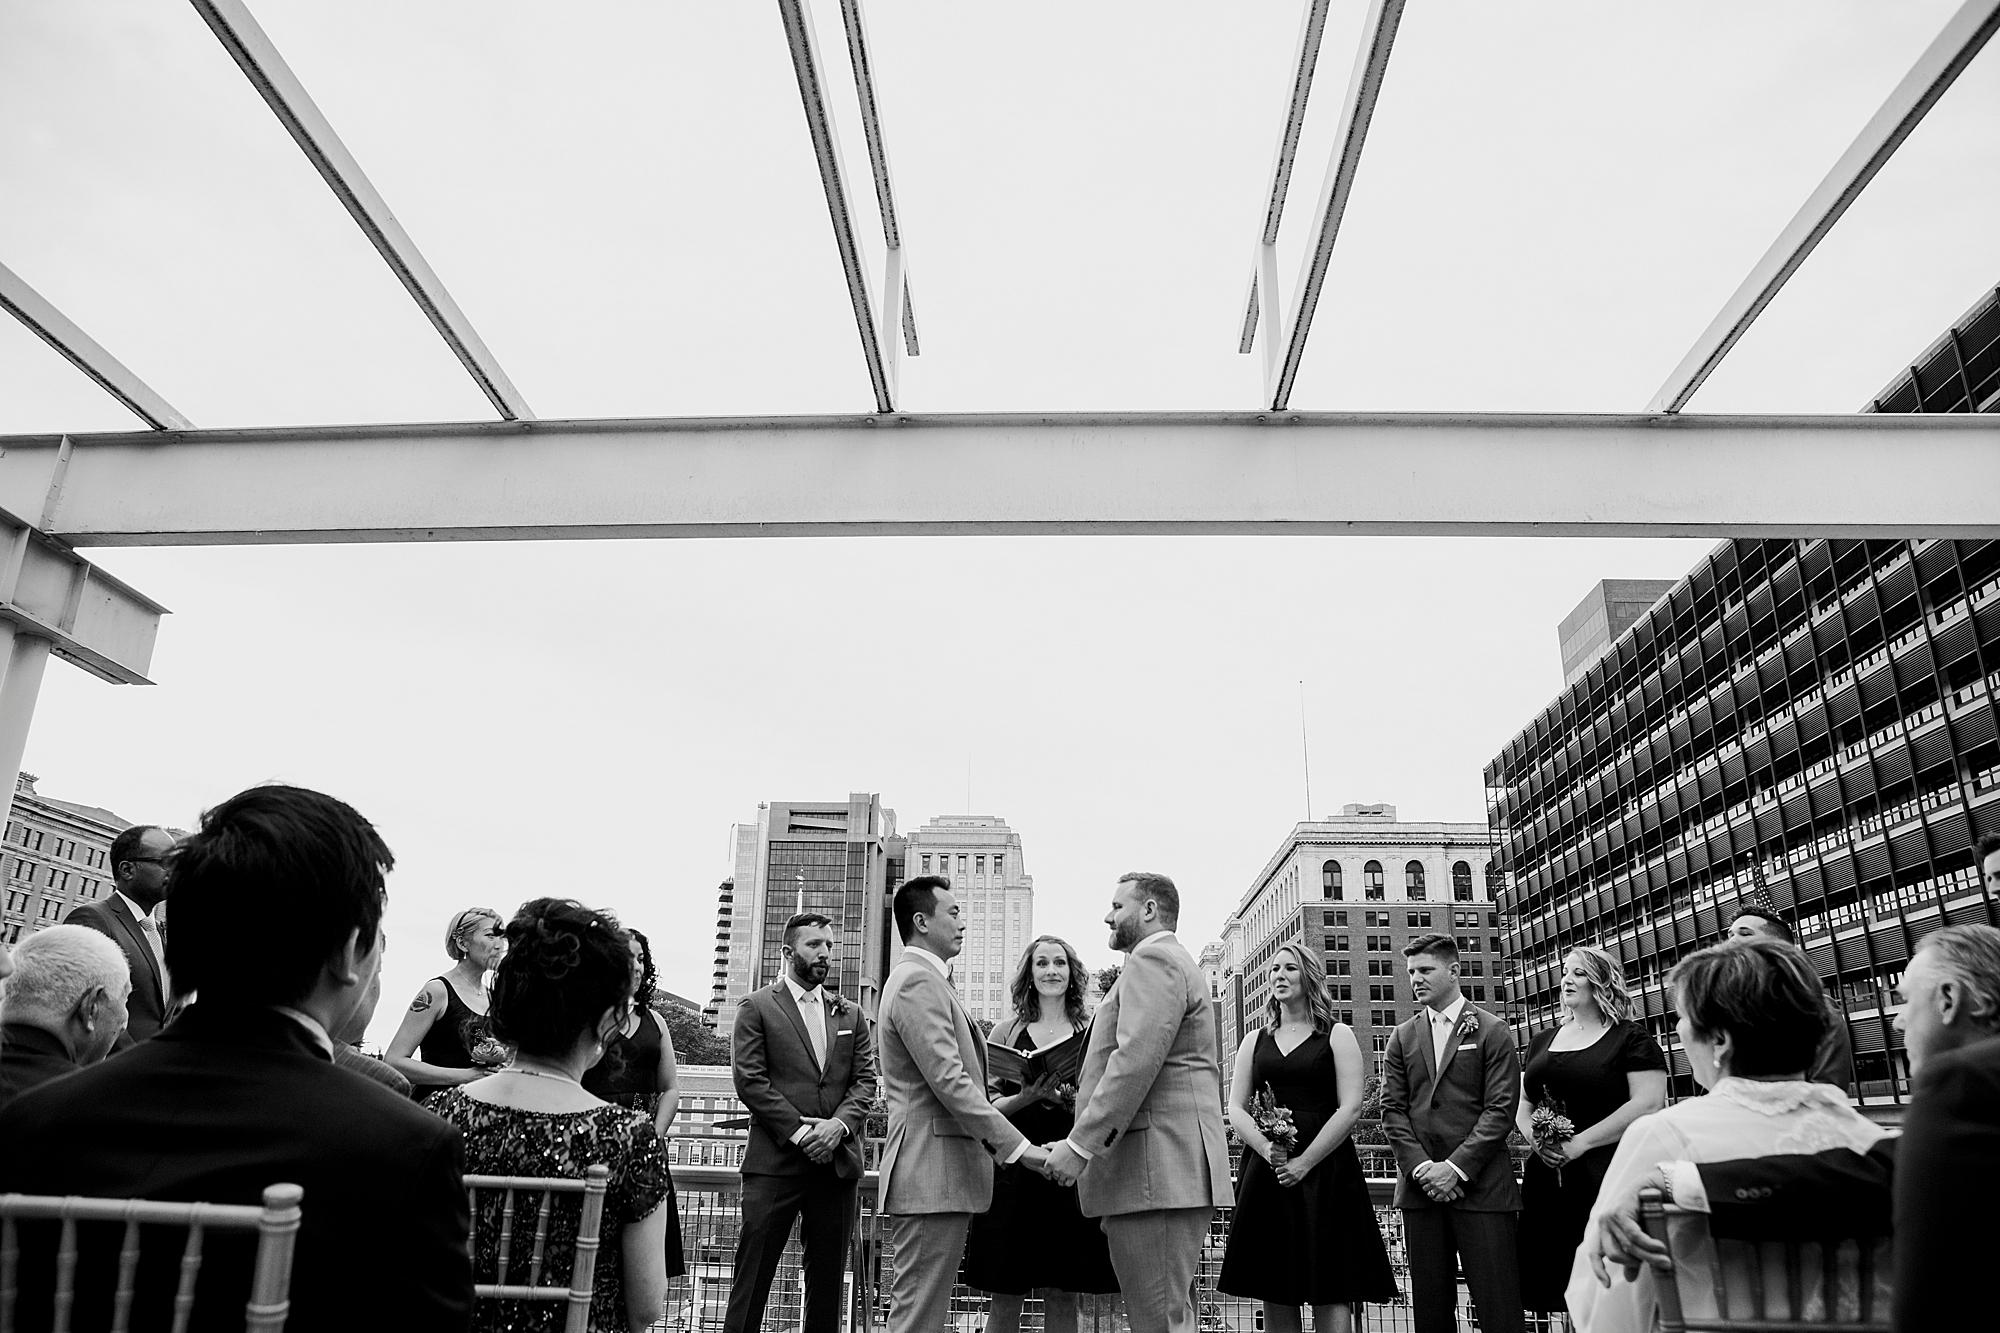 Dan_and_Byron_Love_by_Joe_Mac_Philadelphia_Wedding_LGBTQ_Photography_Gay_Independence_visitor_Center_88.JPG